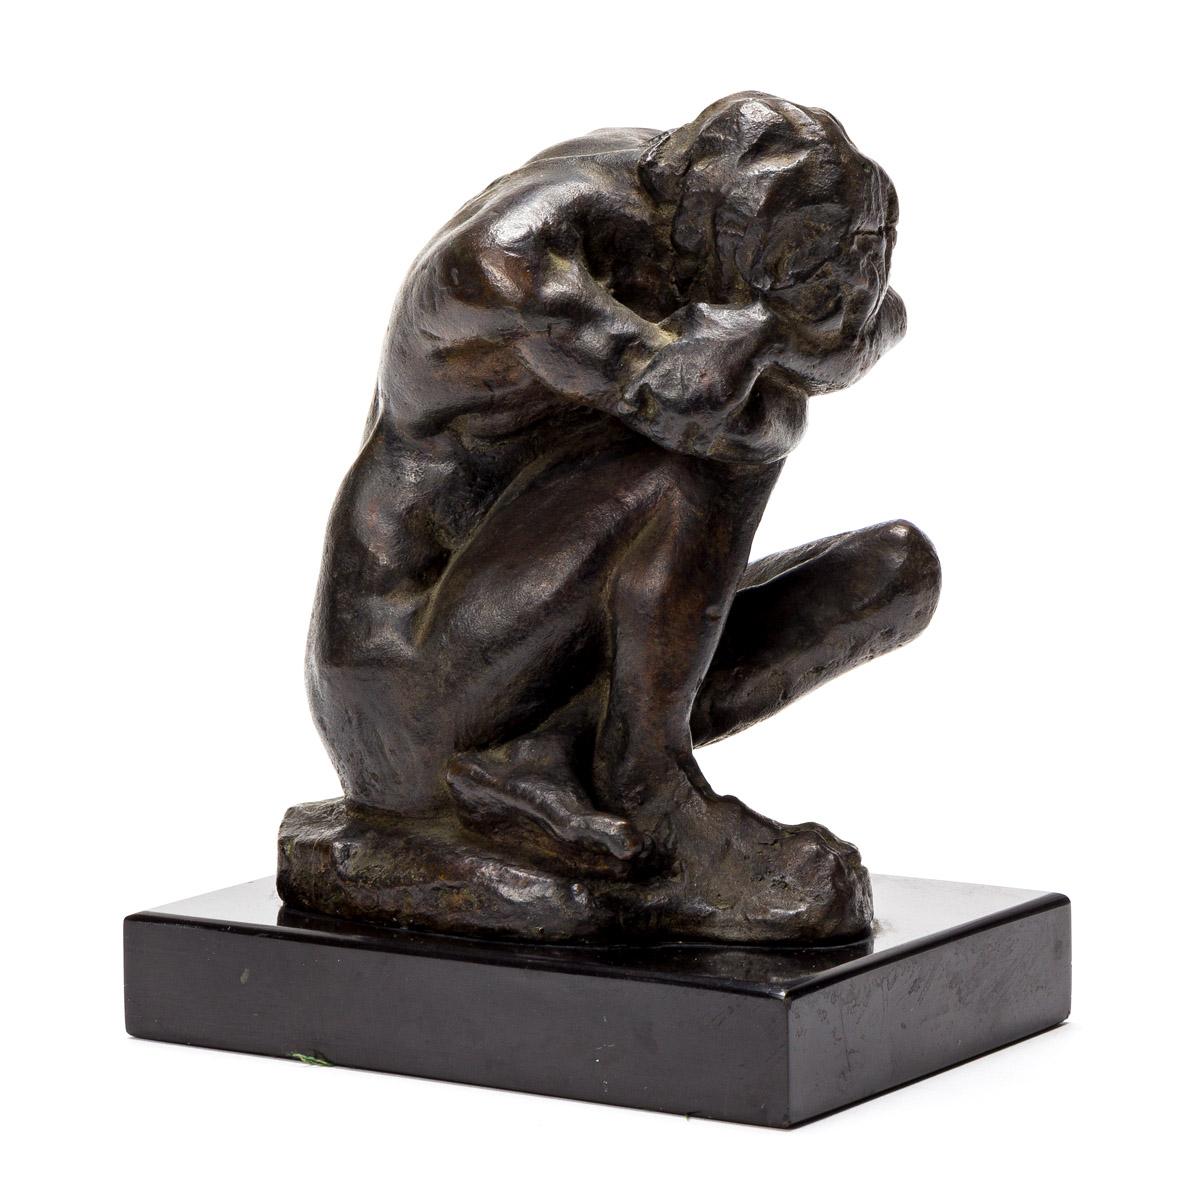 ABRAHAM WALKOWITZ (1878-1965) Crouching Male Nude.